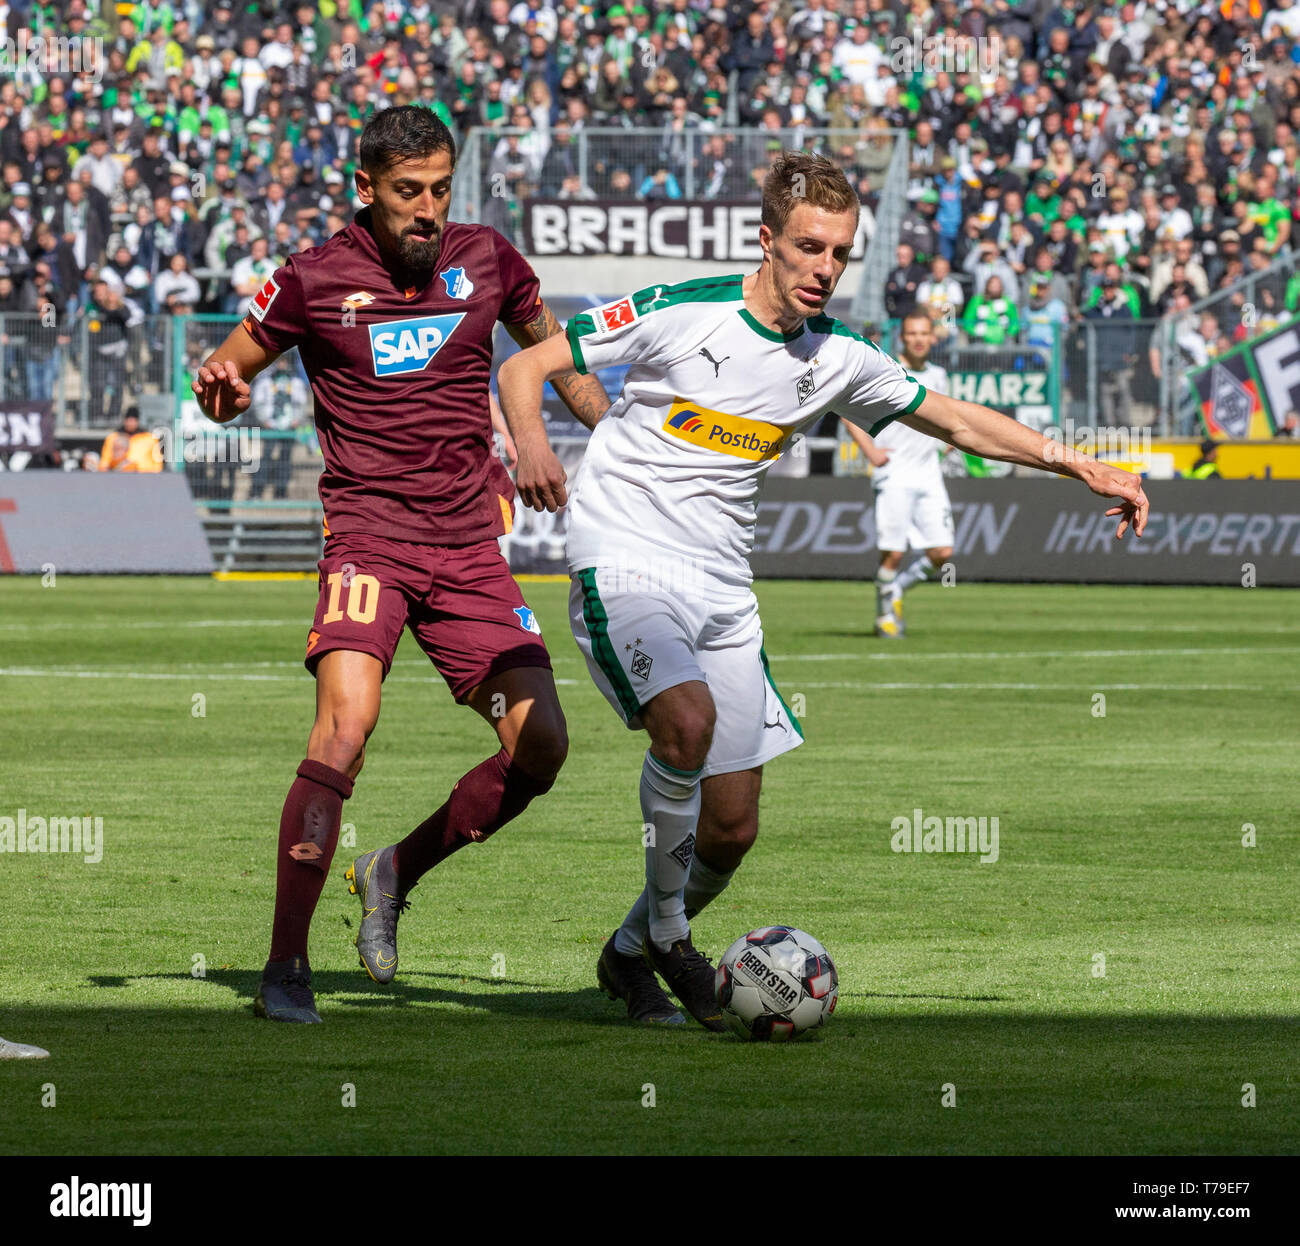 sports, football, Bundesliga, 2018/2019, Borussia Moenchengladbach vs. TSG 1899 Hoffenheim 2-2, Stadium Borussia Park, scene of the match, Patrick Herrmann (MG) in ball possession, left Kerem Demirbay (TSG), DFL REGULATIONS PROHIBIT ANY USE OF PHOTOGRAPHS AS IMAGE SEQUENCES AND/OR QUASI-VIDEO - Stock Image